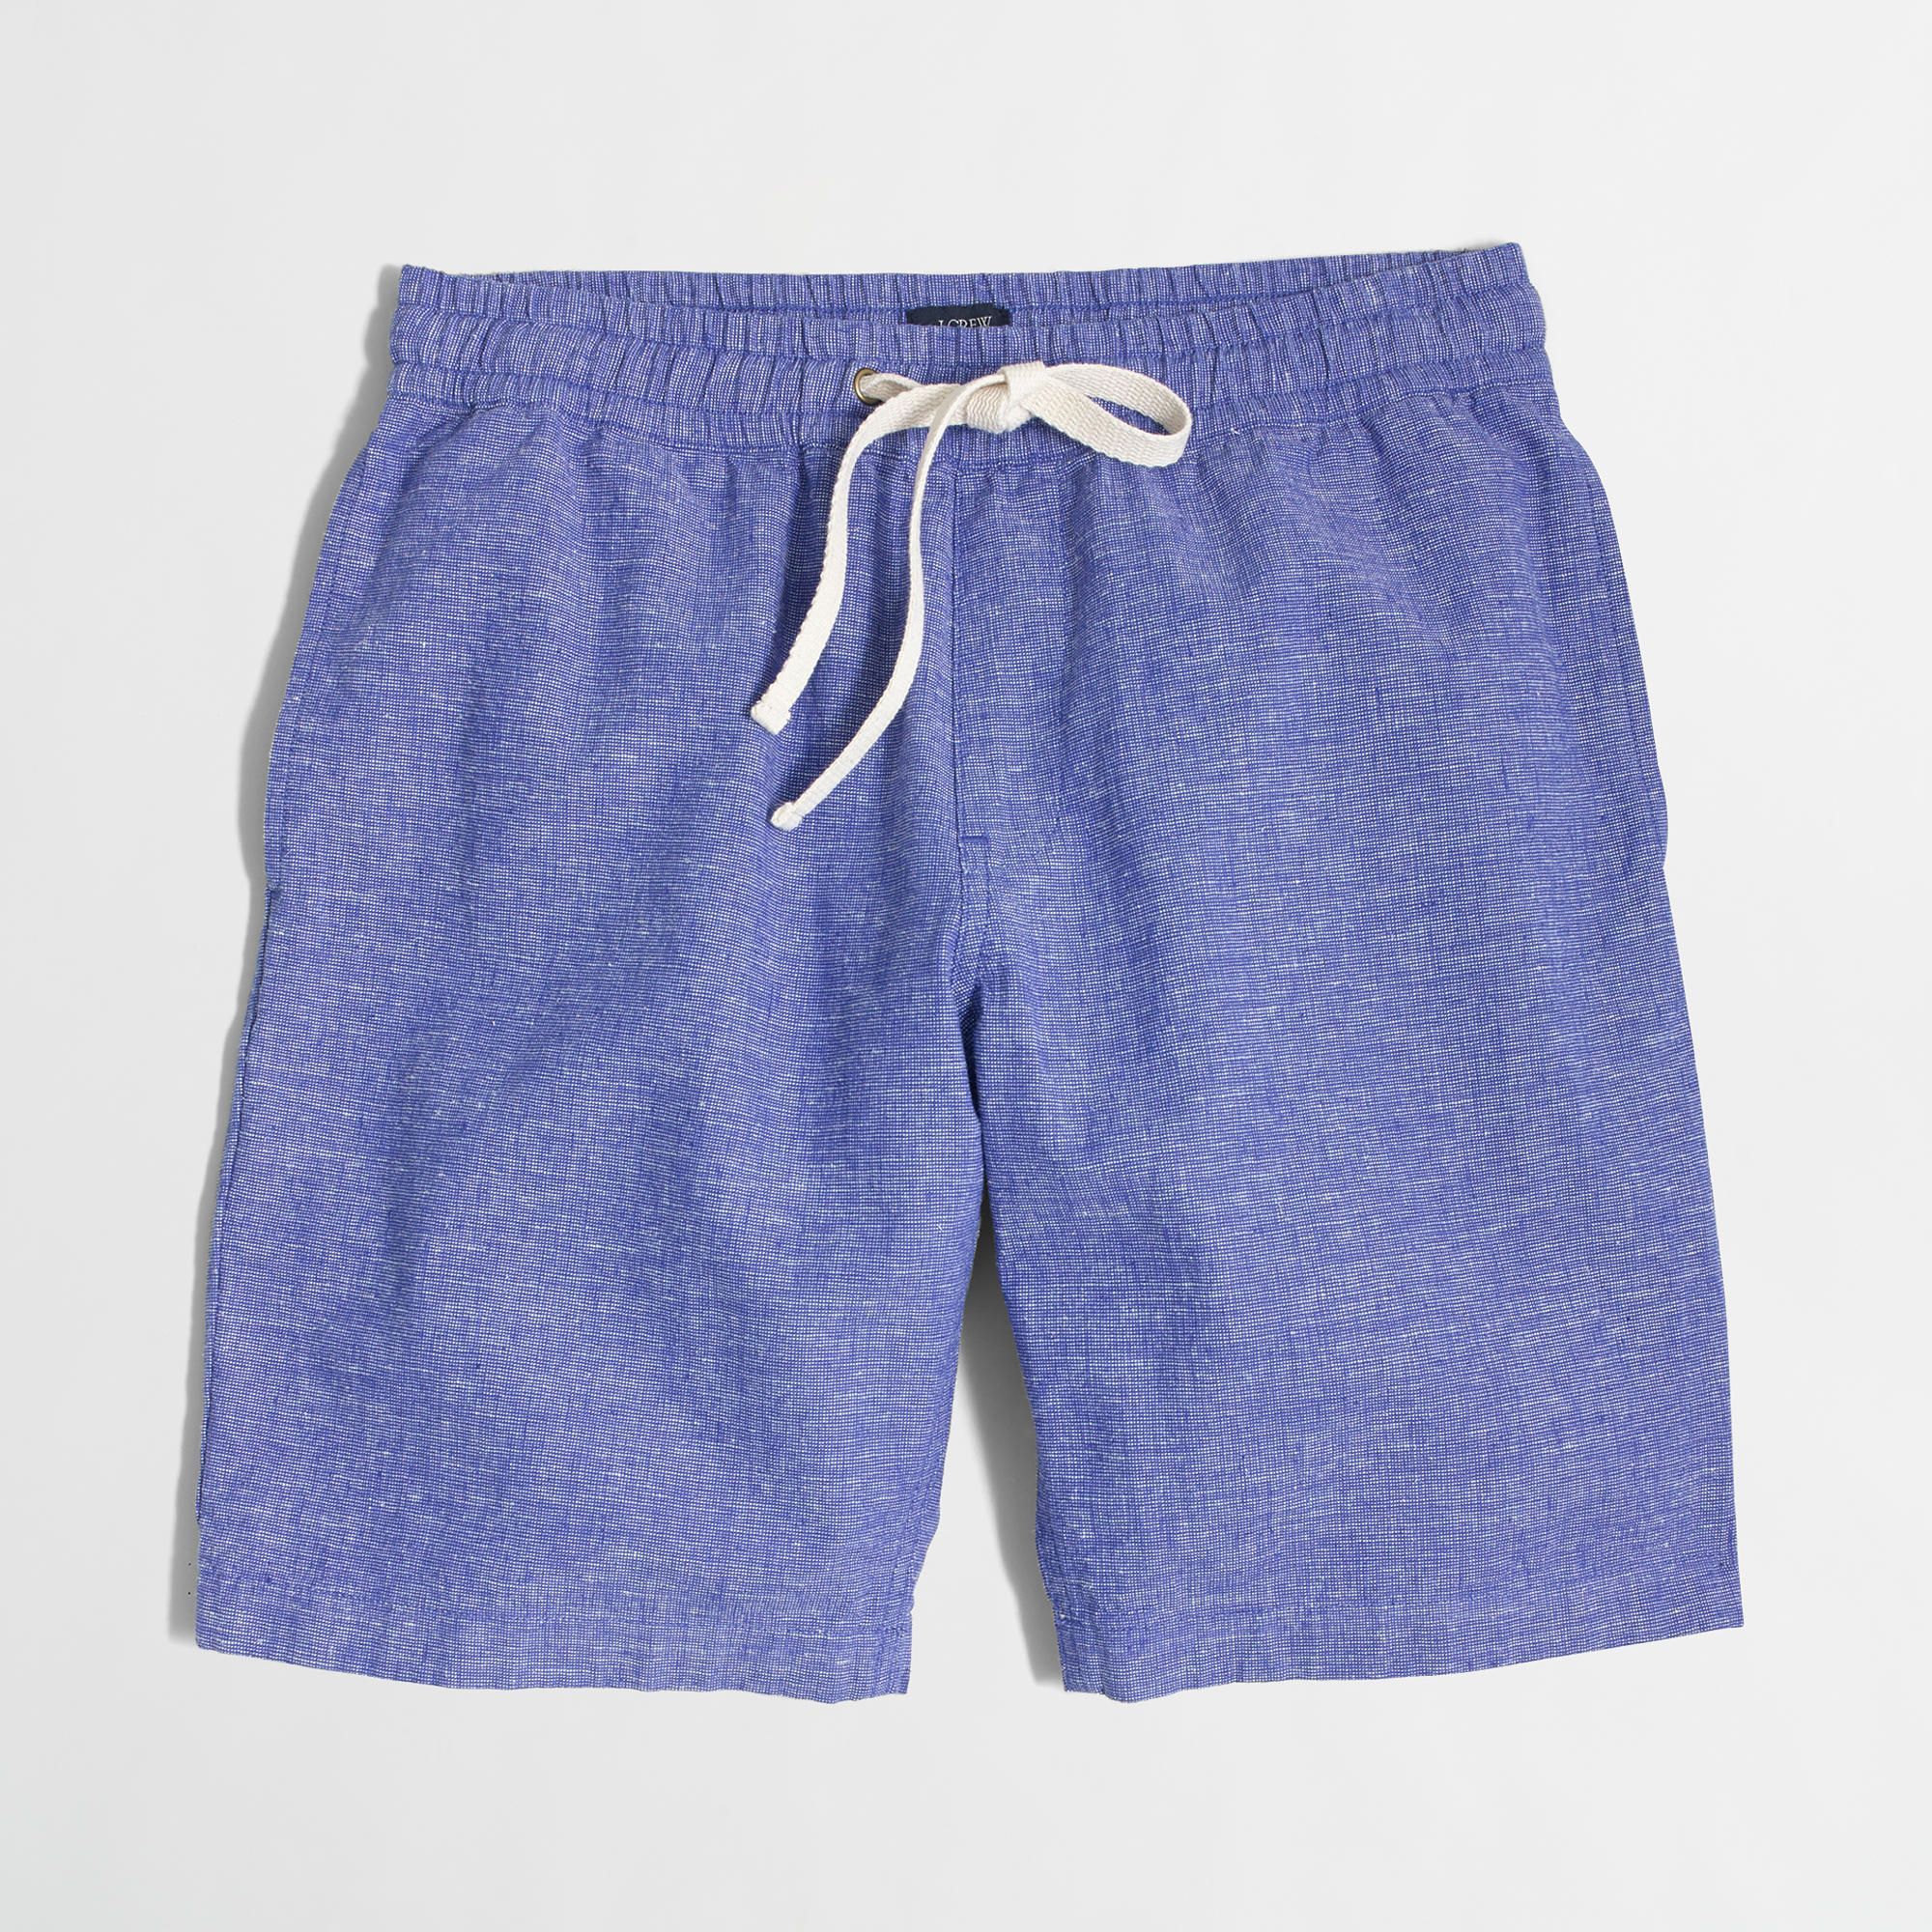 best mens shorts 2016